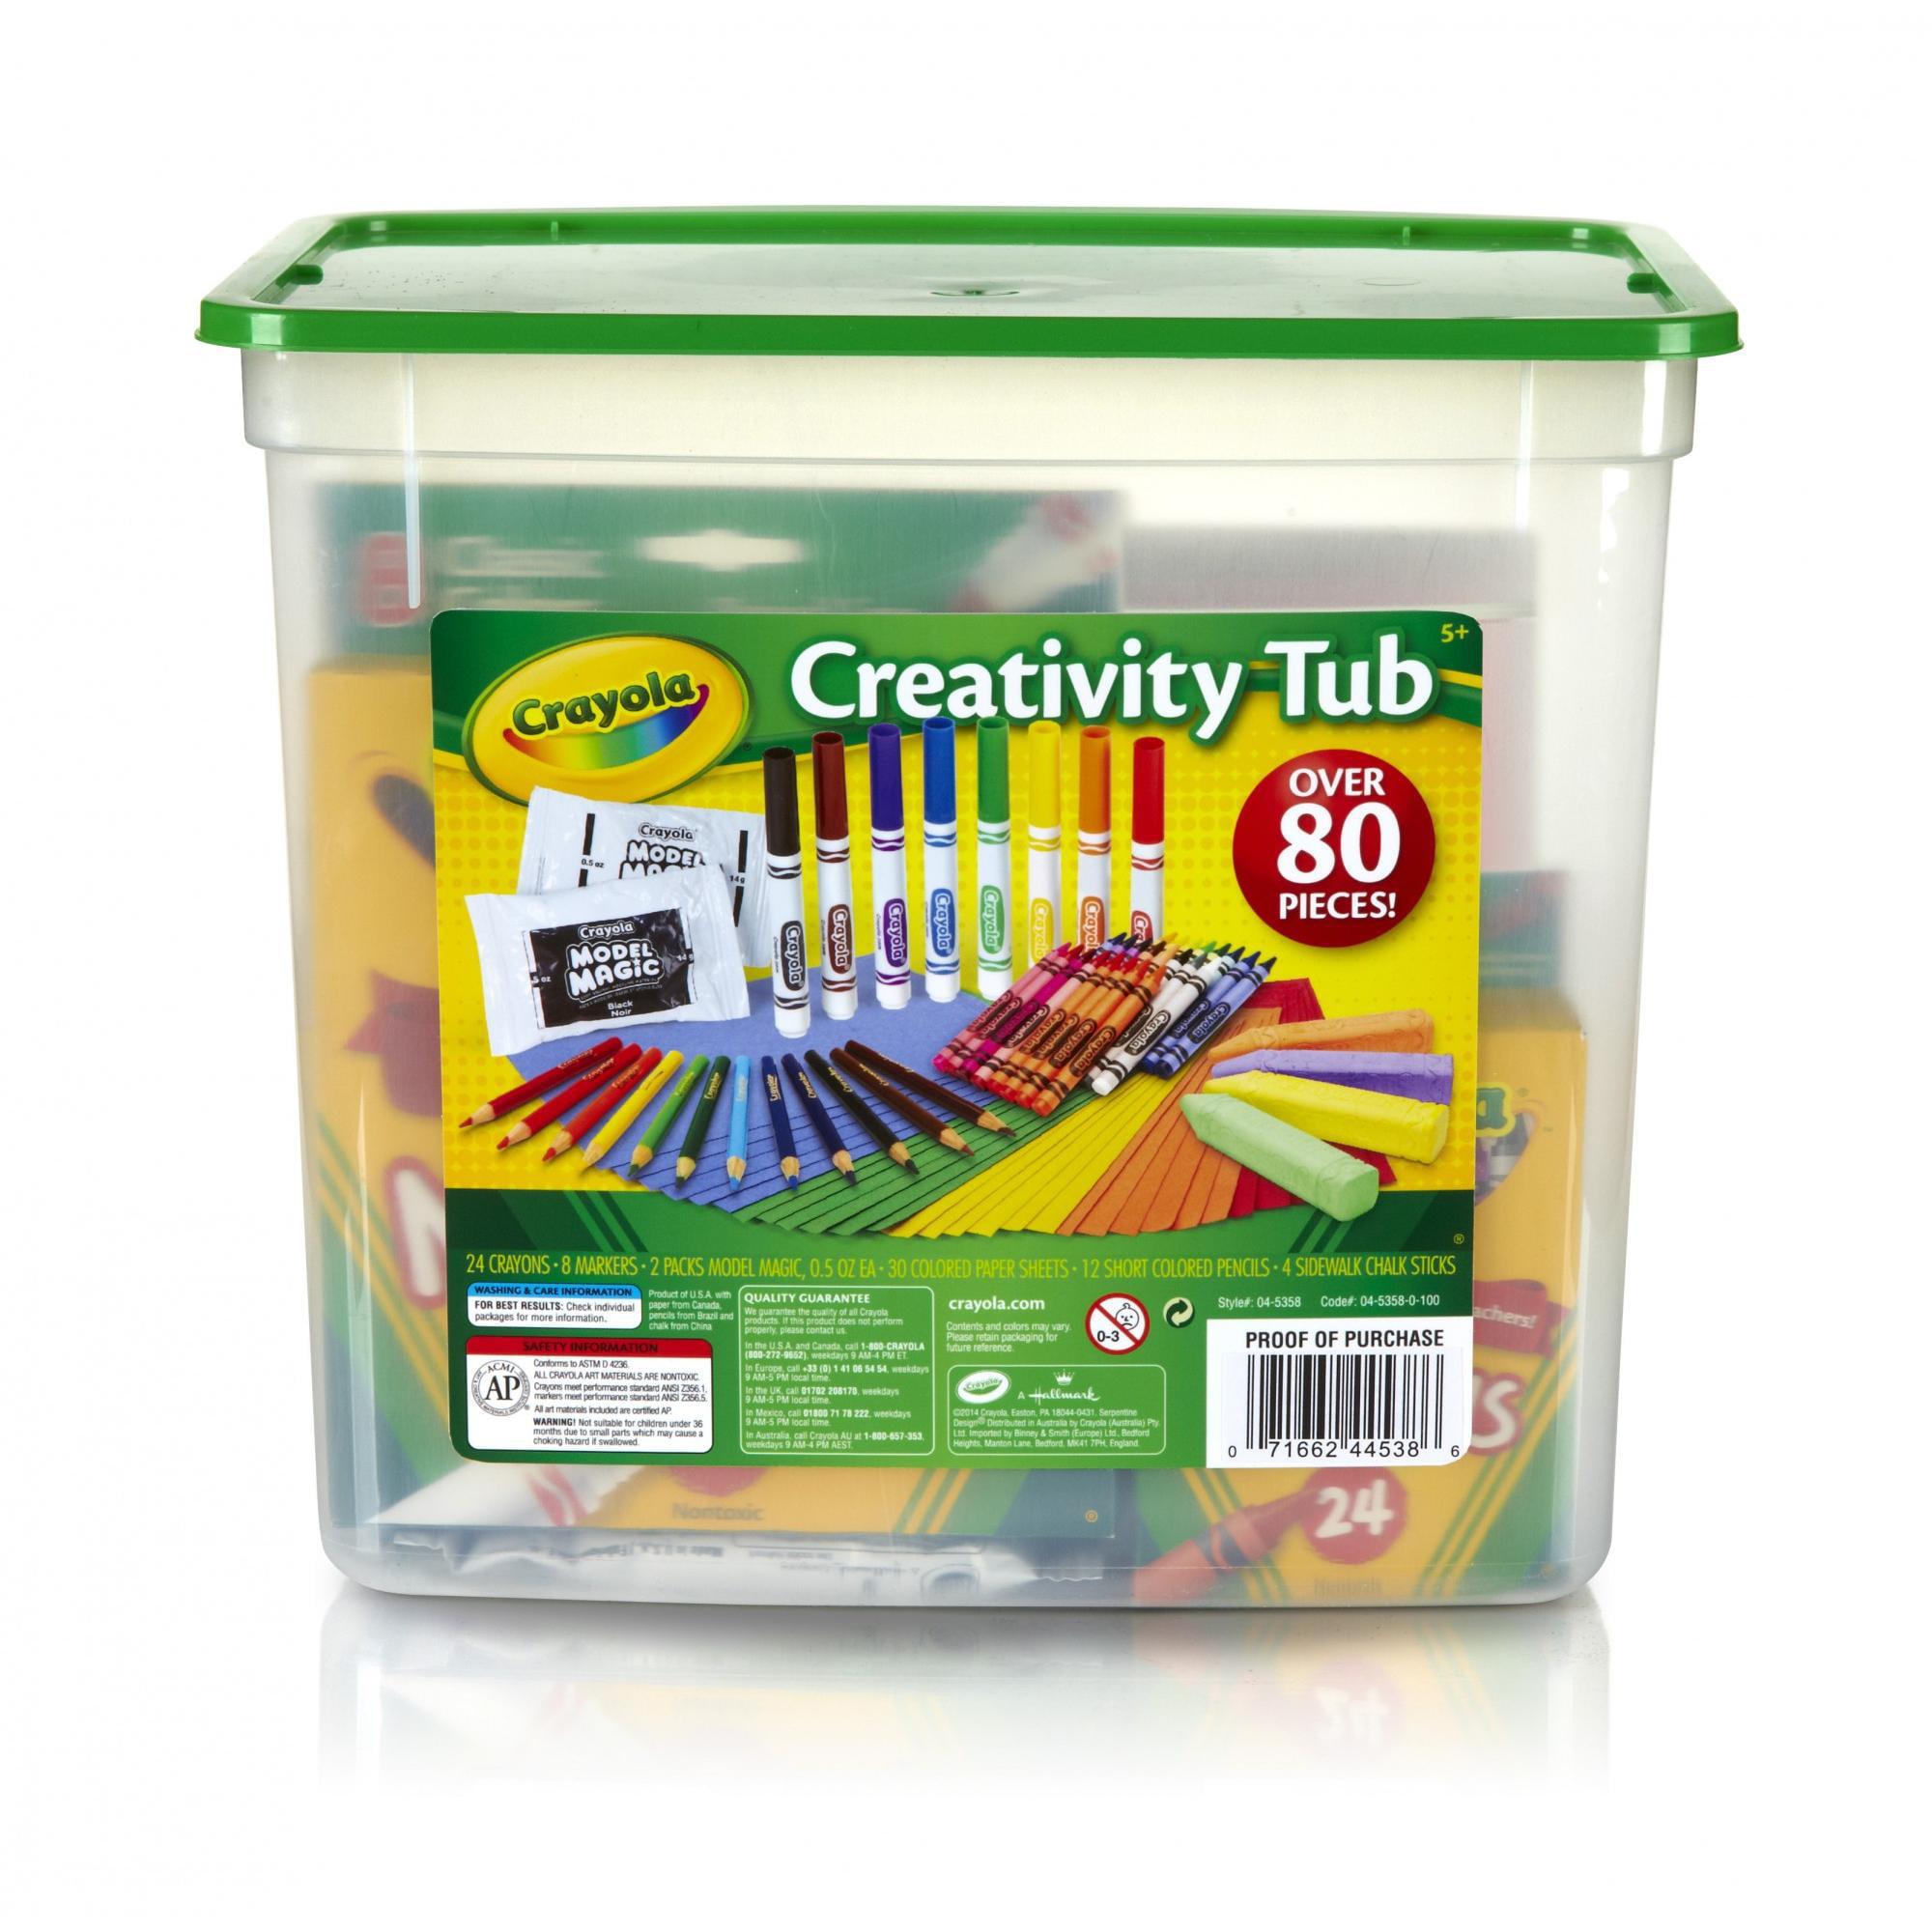 Crayola Creativity Tub, Art Supplies, Gift for Kids, 80 Pieces